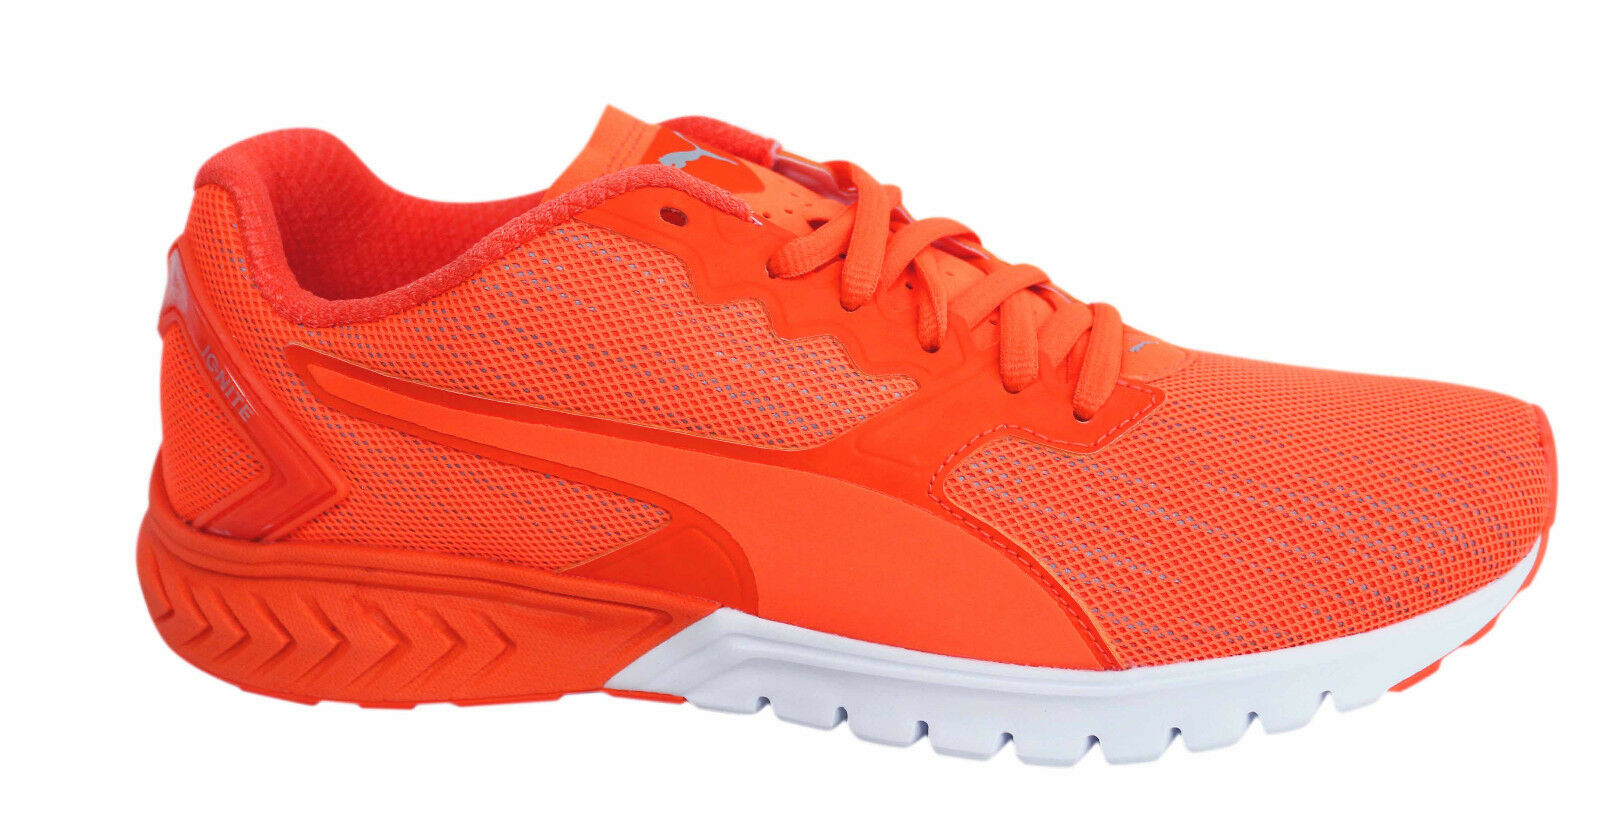 Puma Ignite Dual Nightcat Orange Lace Up Mens Trainers 189354 02 U15